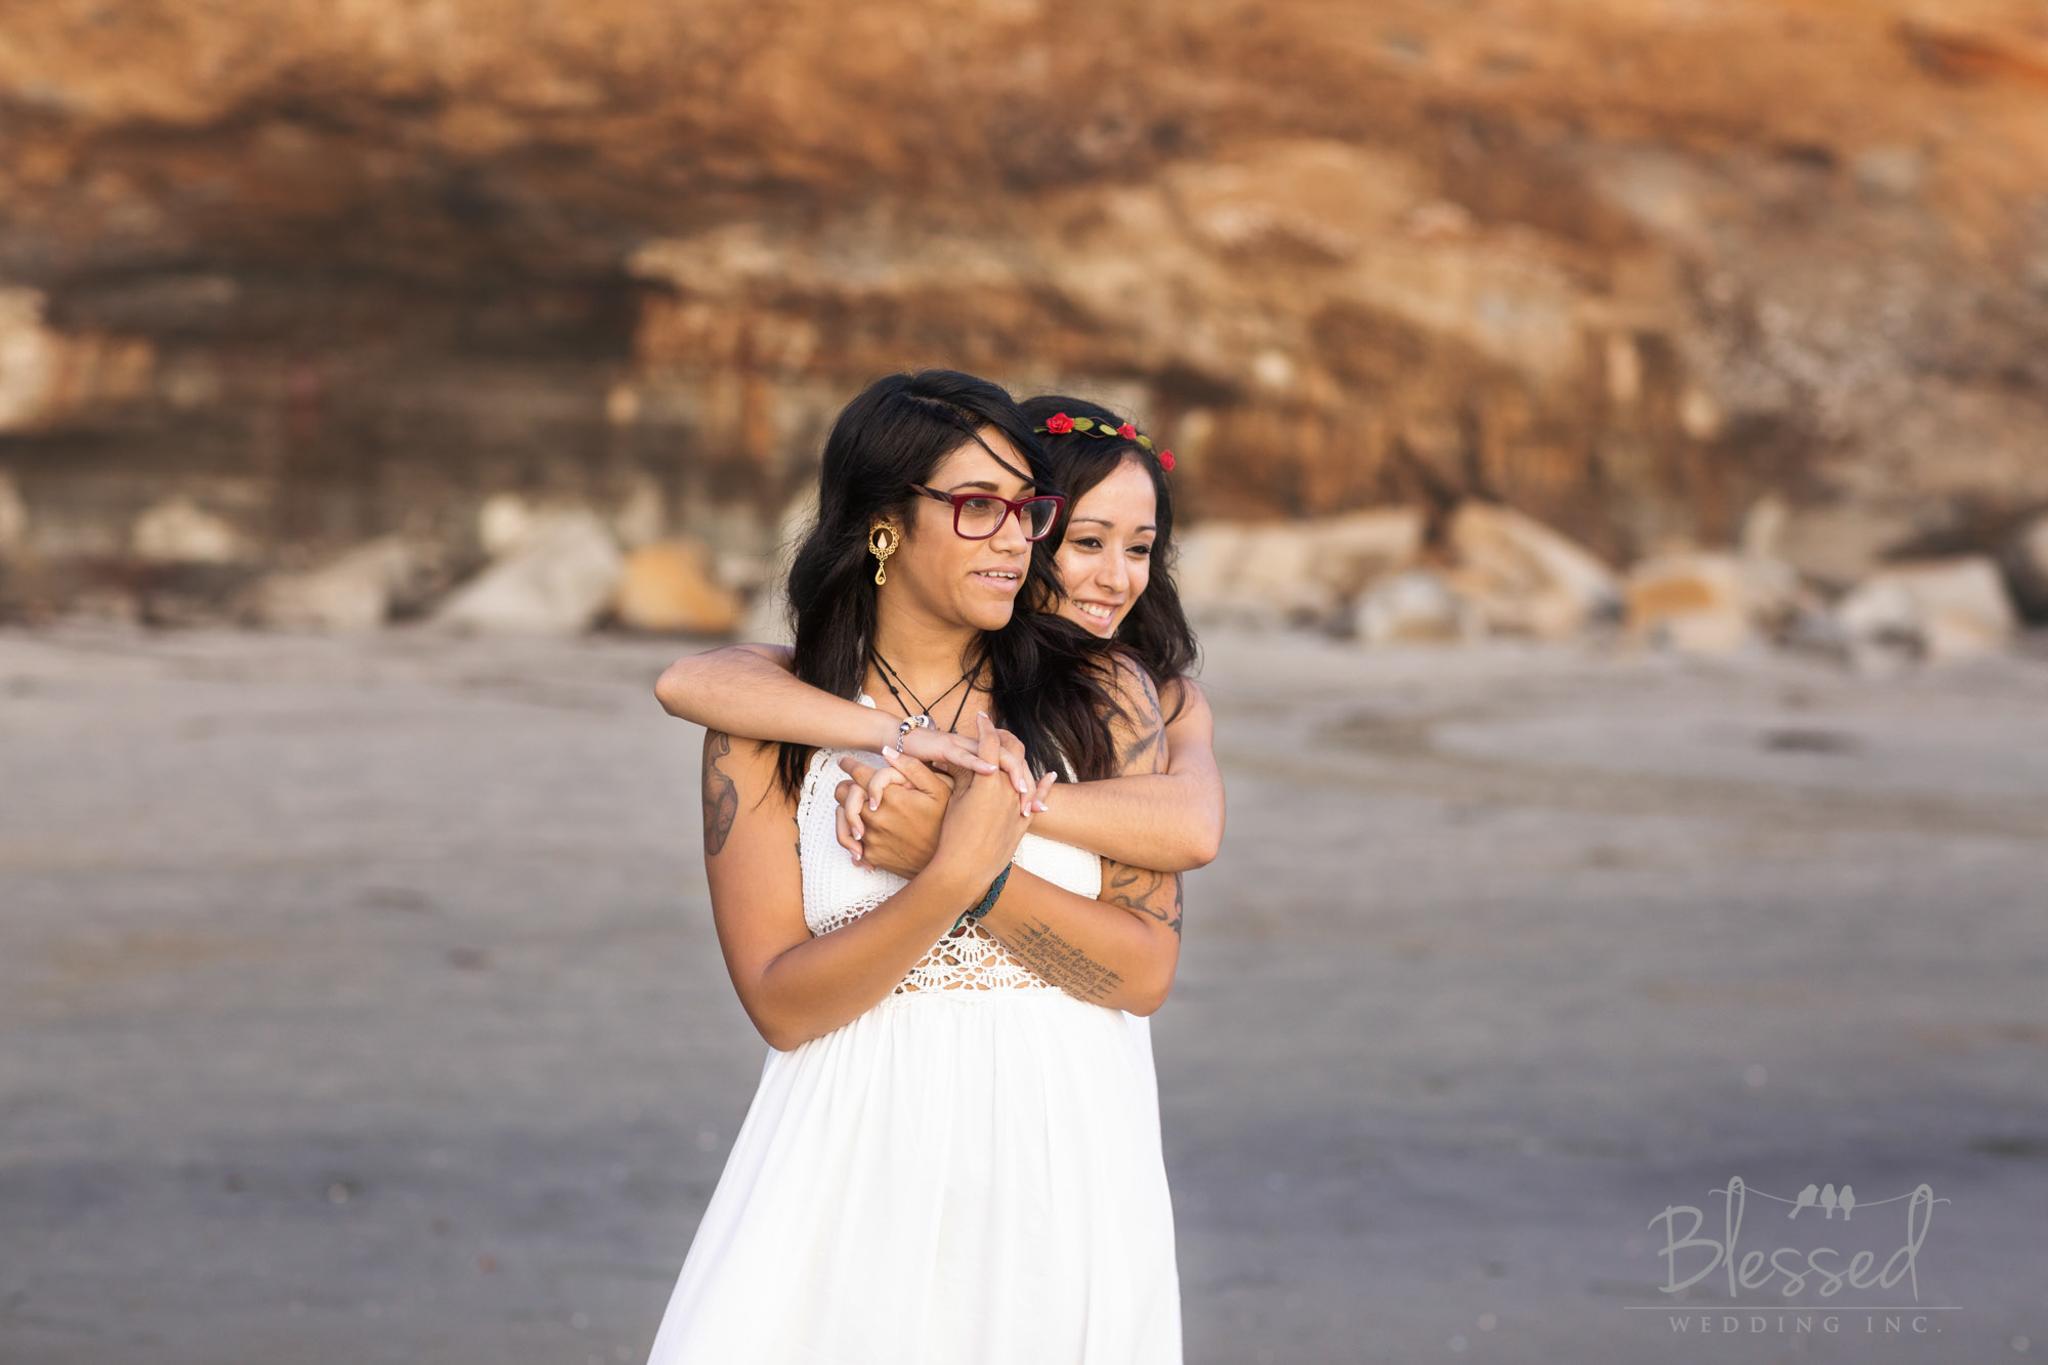 La Jolla Beach Engagement Session by San Diego Wedding Photographers Blessed Wedding-44.jpg